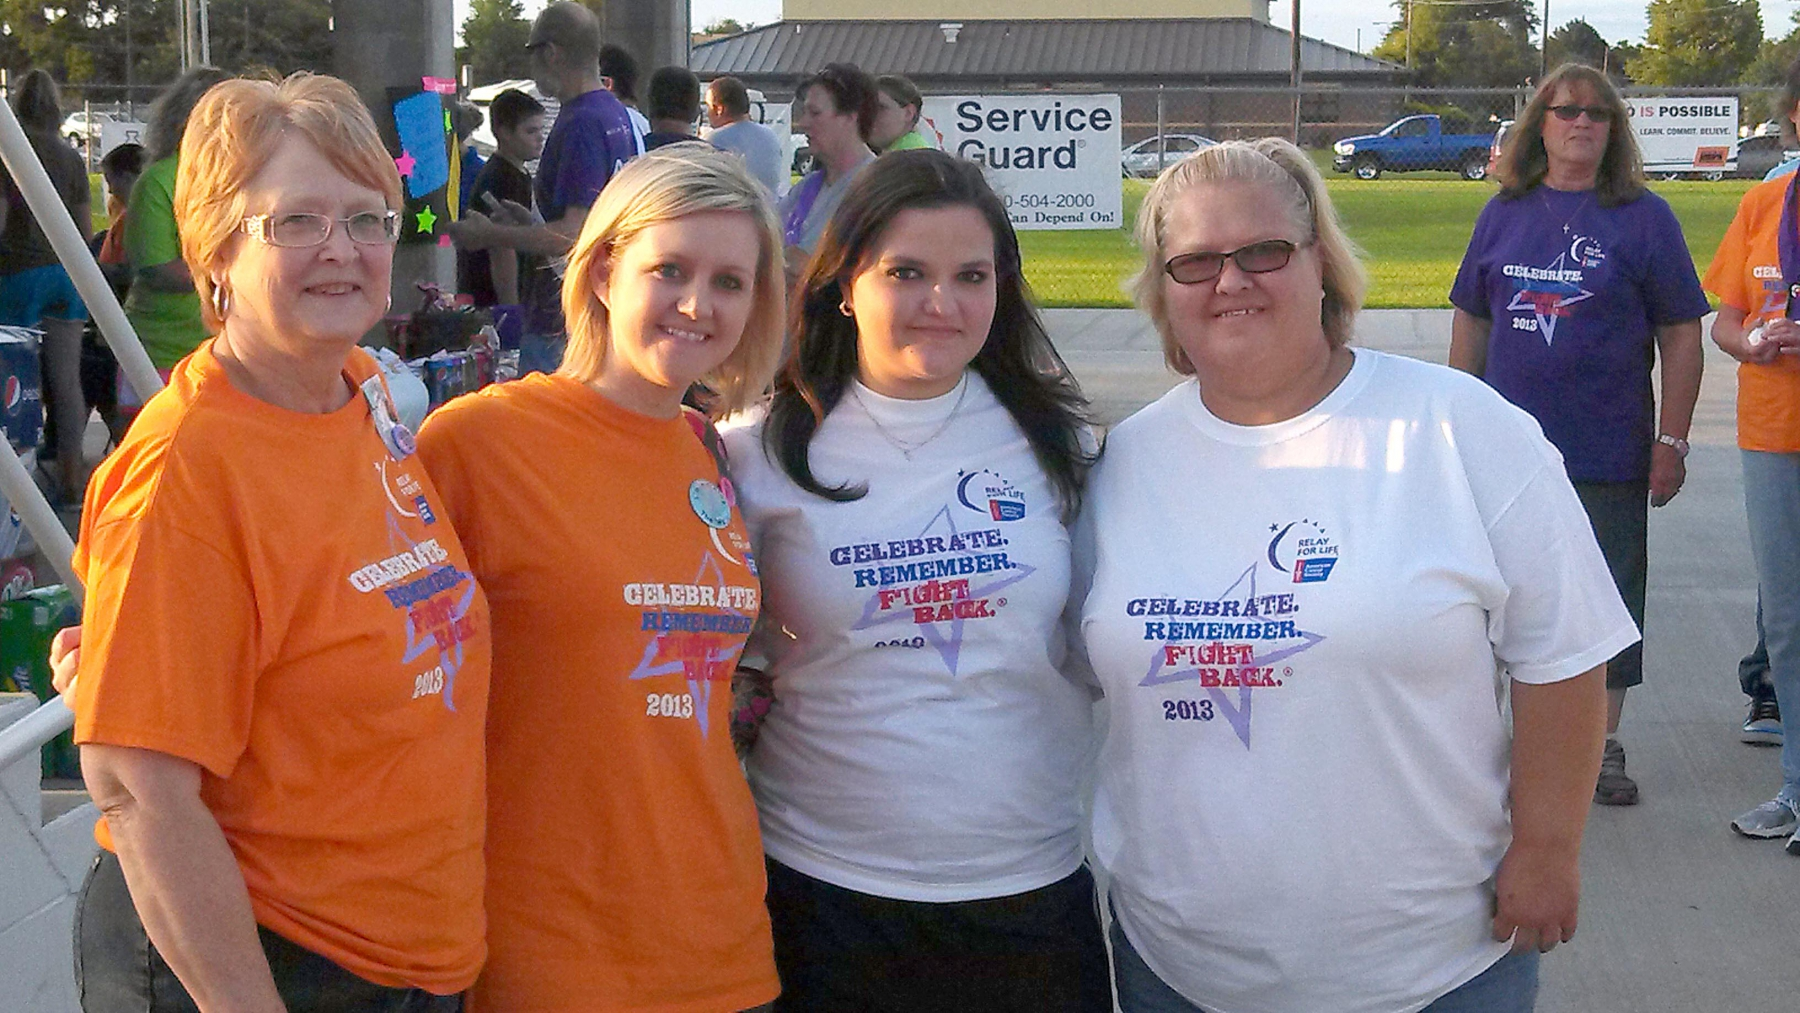 2013 Karen, Erica, Stephanie Franco, Ellen Watkins Relay For Life